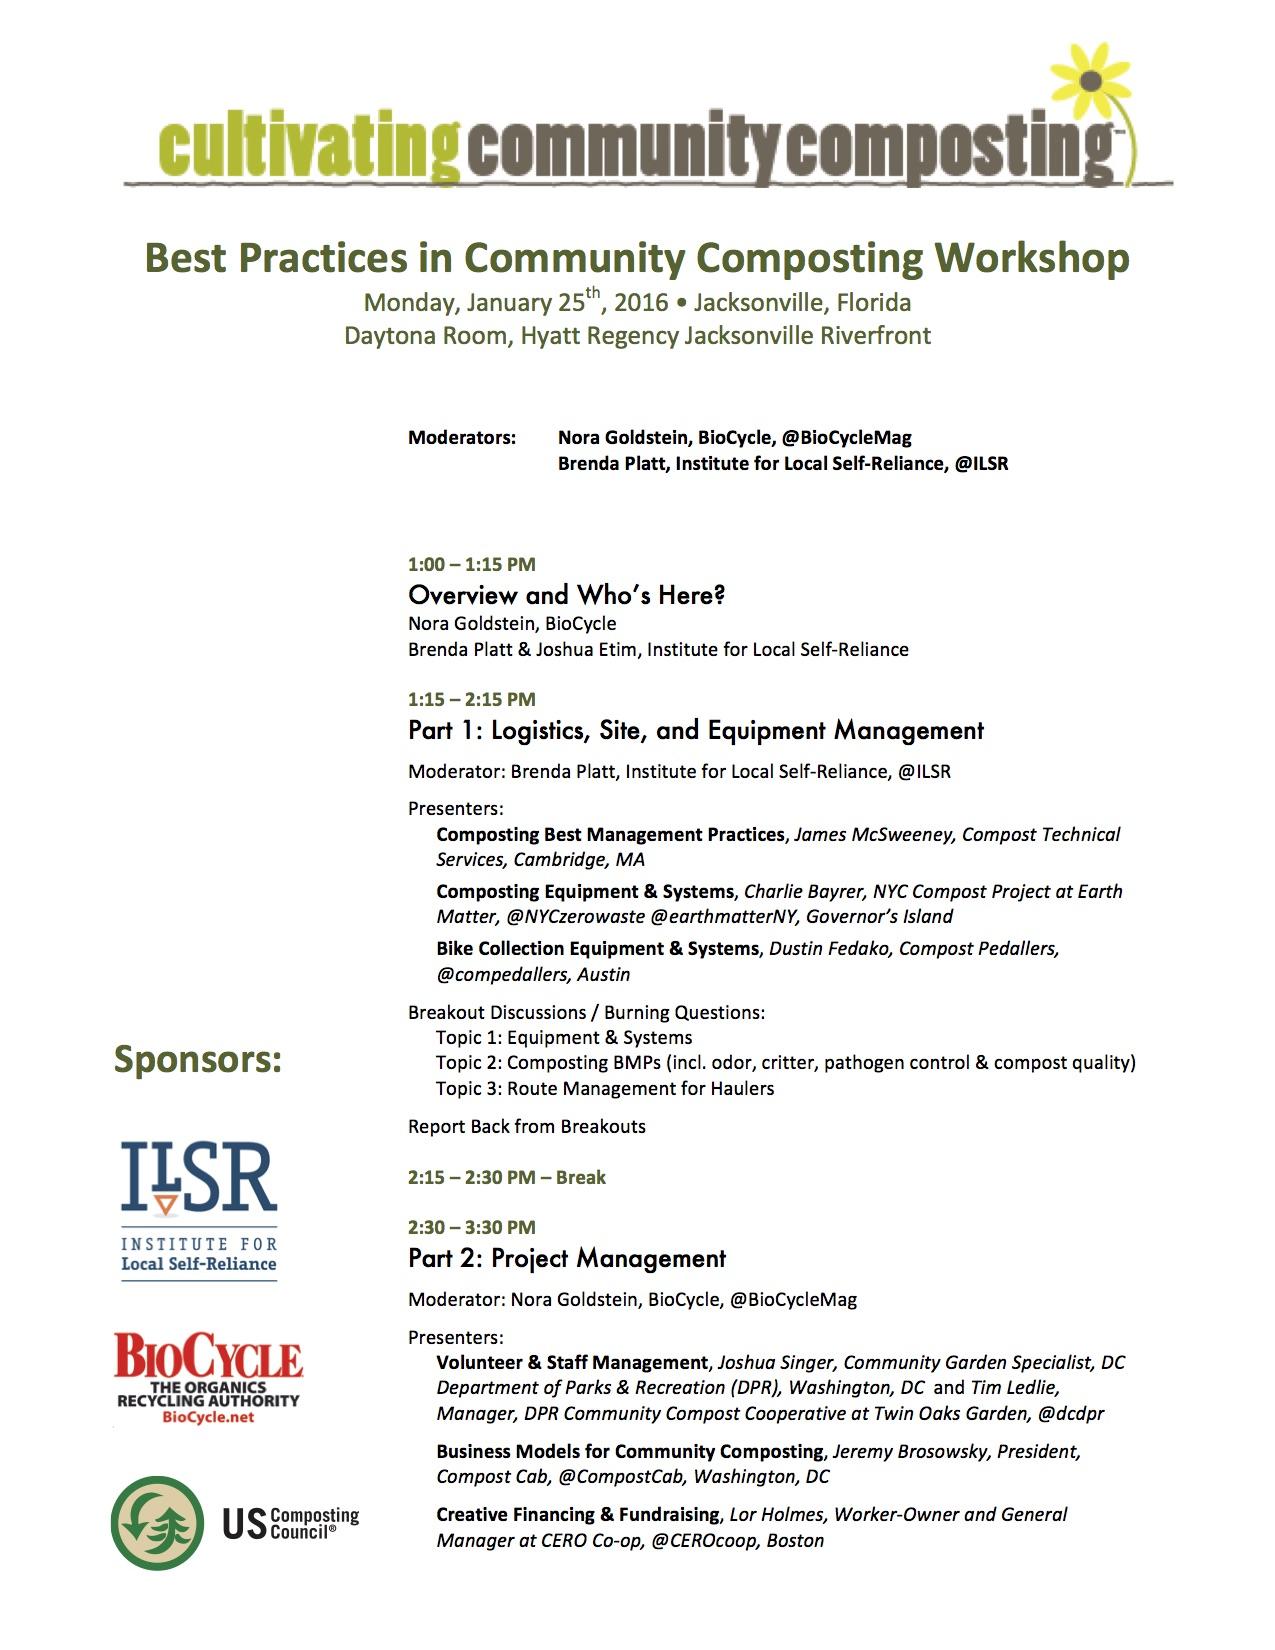 Best Practices in Community Composting agenda 01-24-16 version (1)